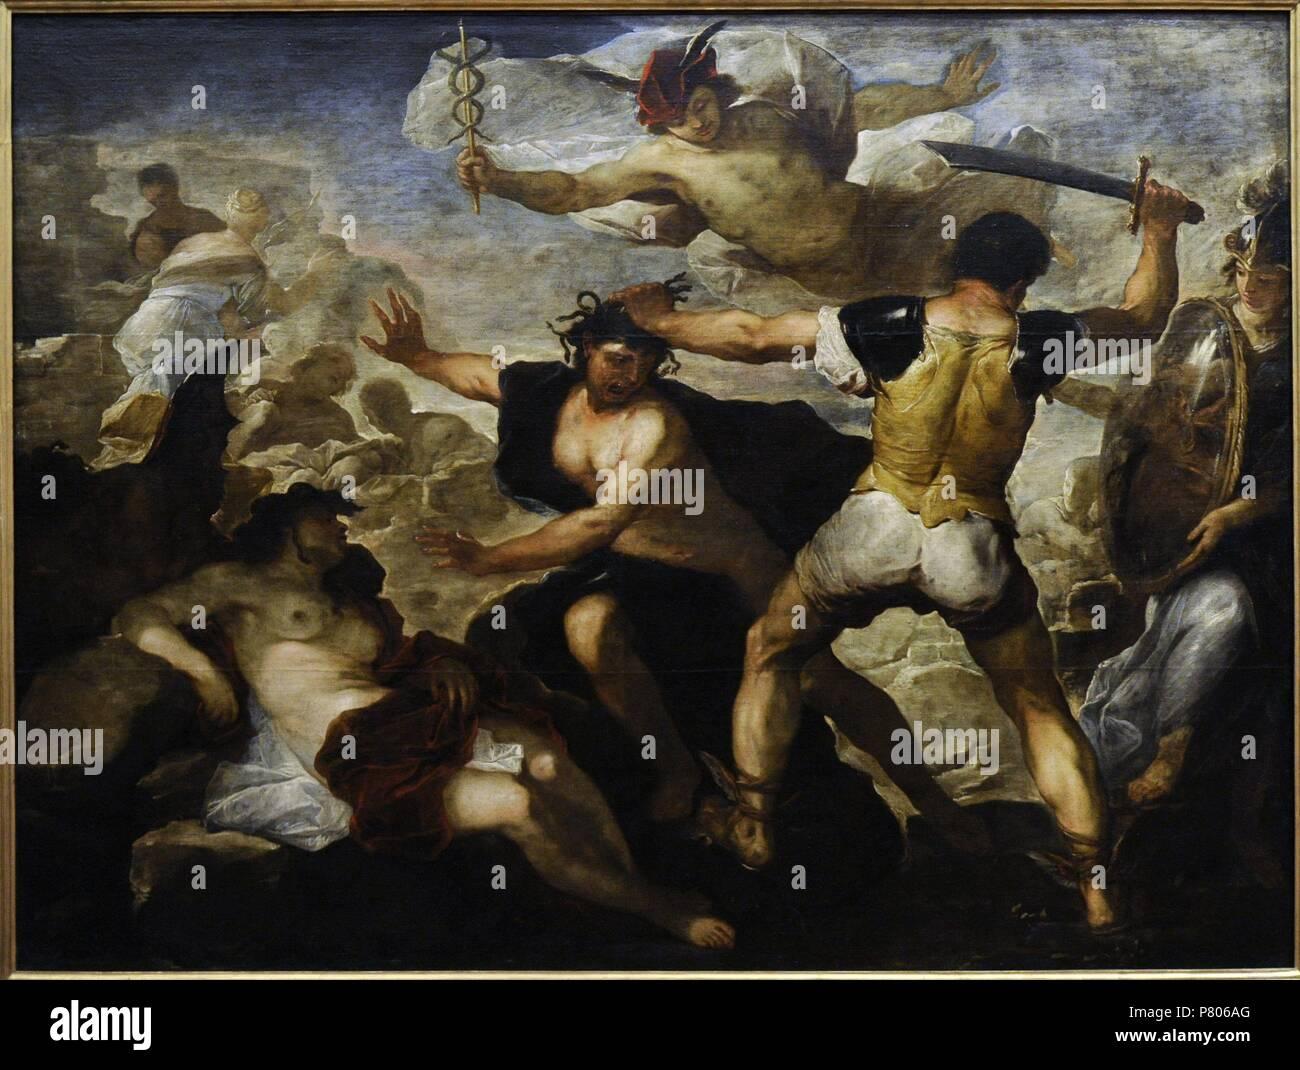 Luca Giordano 1634 1705 Italian Painter Perseus Cutting